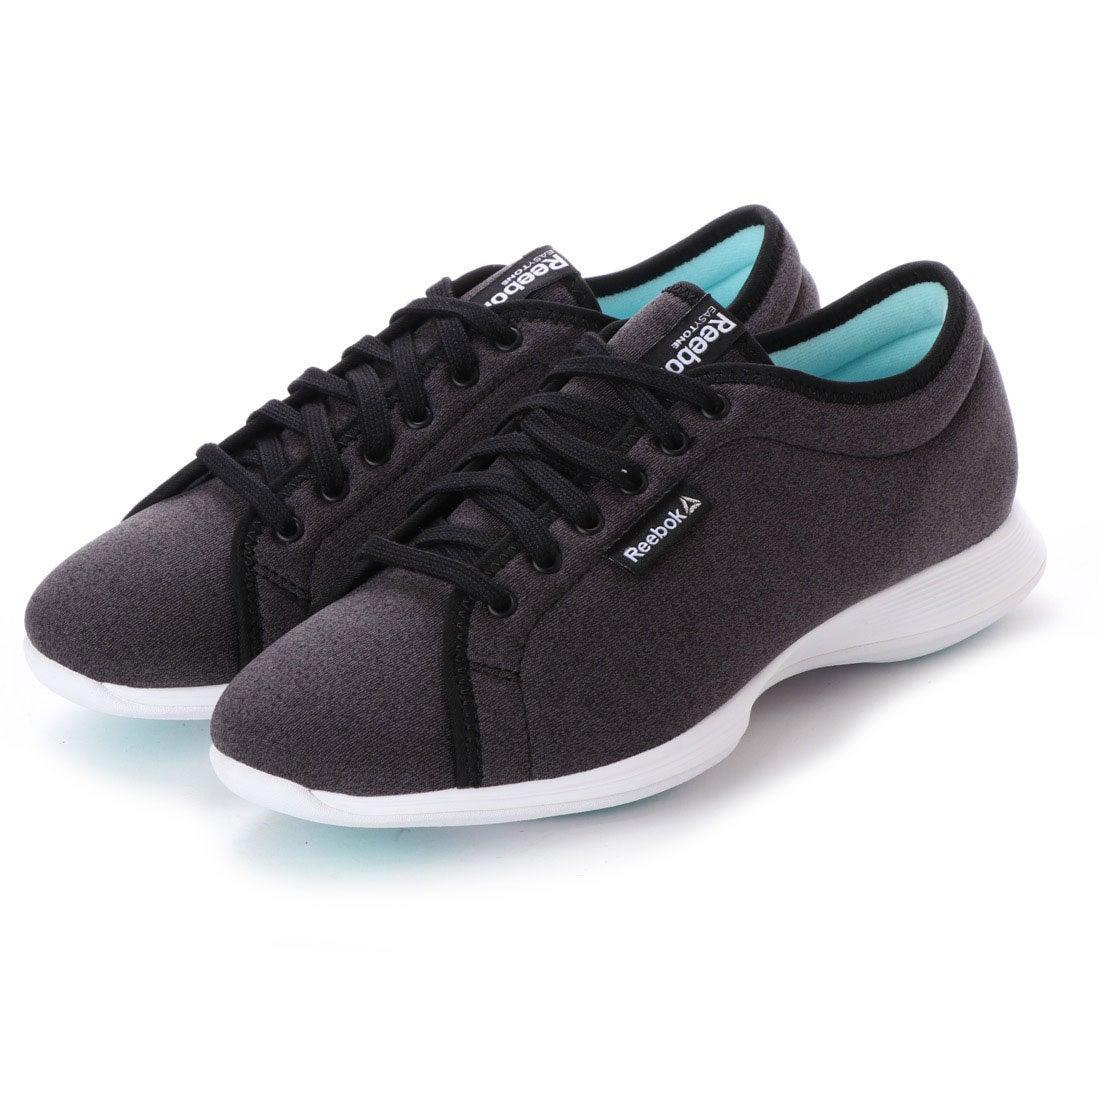 4628997d086b73 リーボック REEBOK EASYTONE 2.0 (ブラック) -靴&ファッション通販 ロコンド〜自宅で試着、気軽に返品